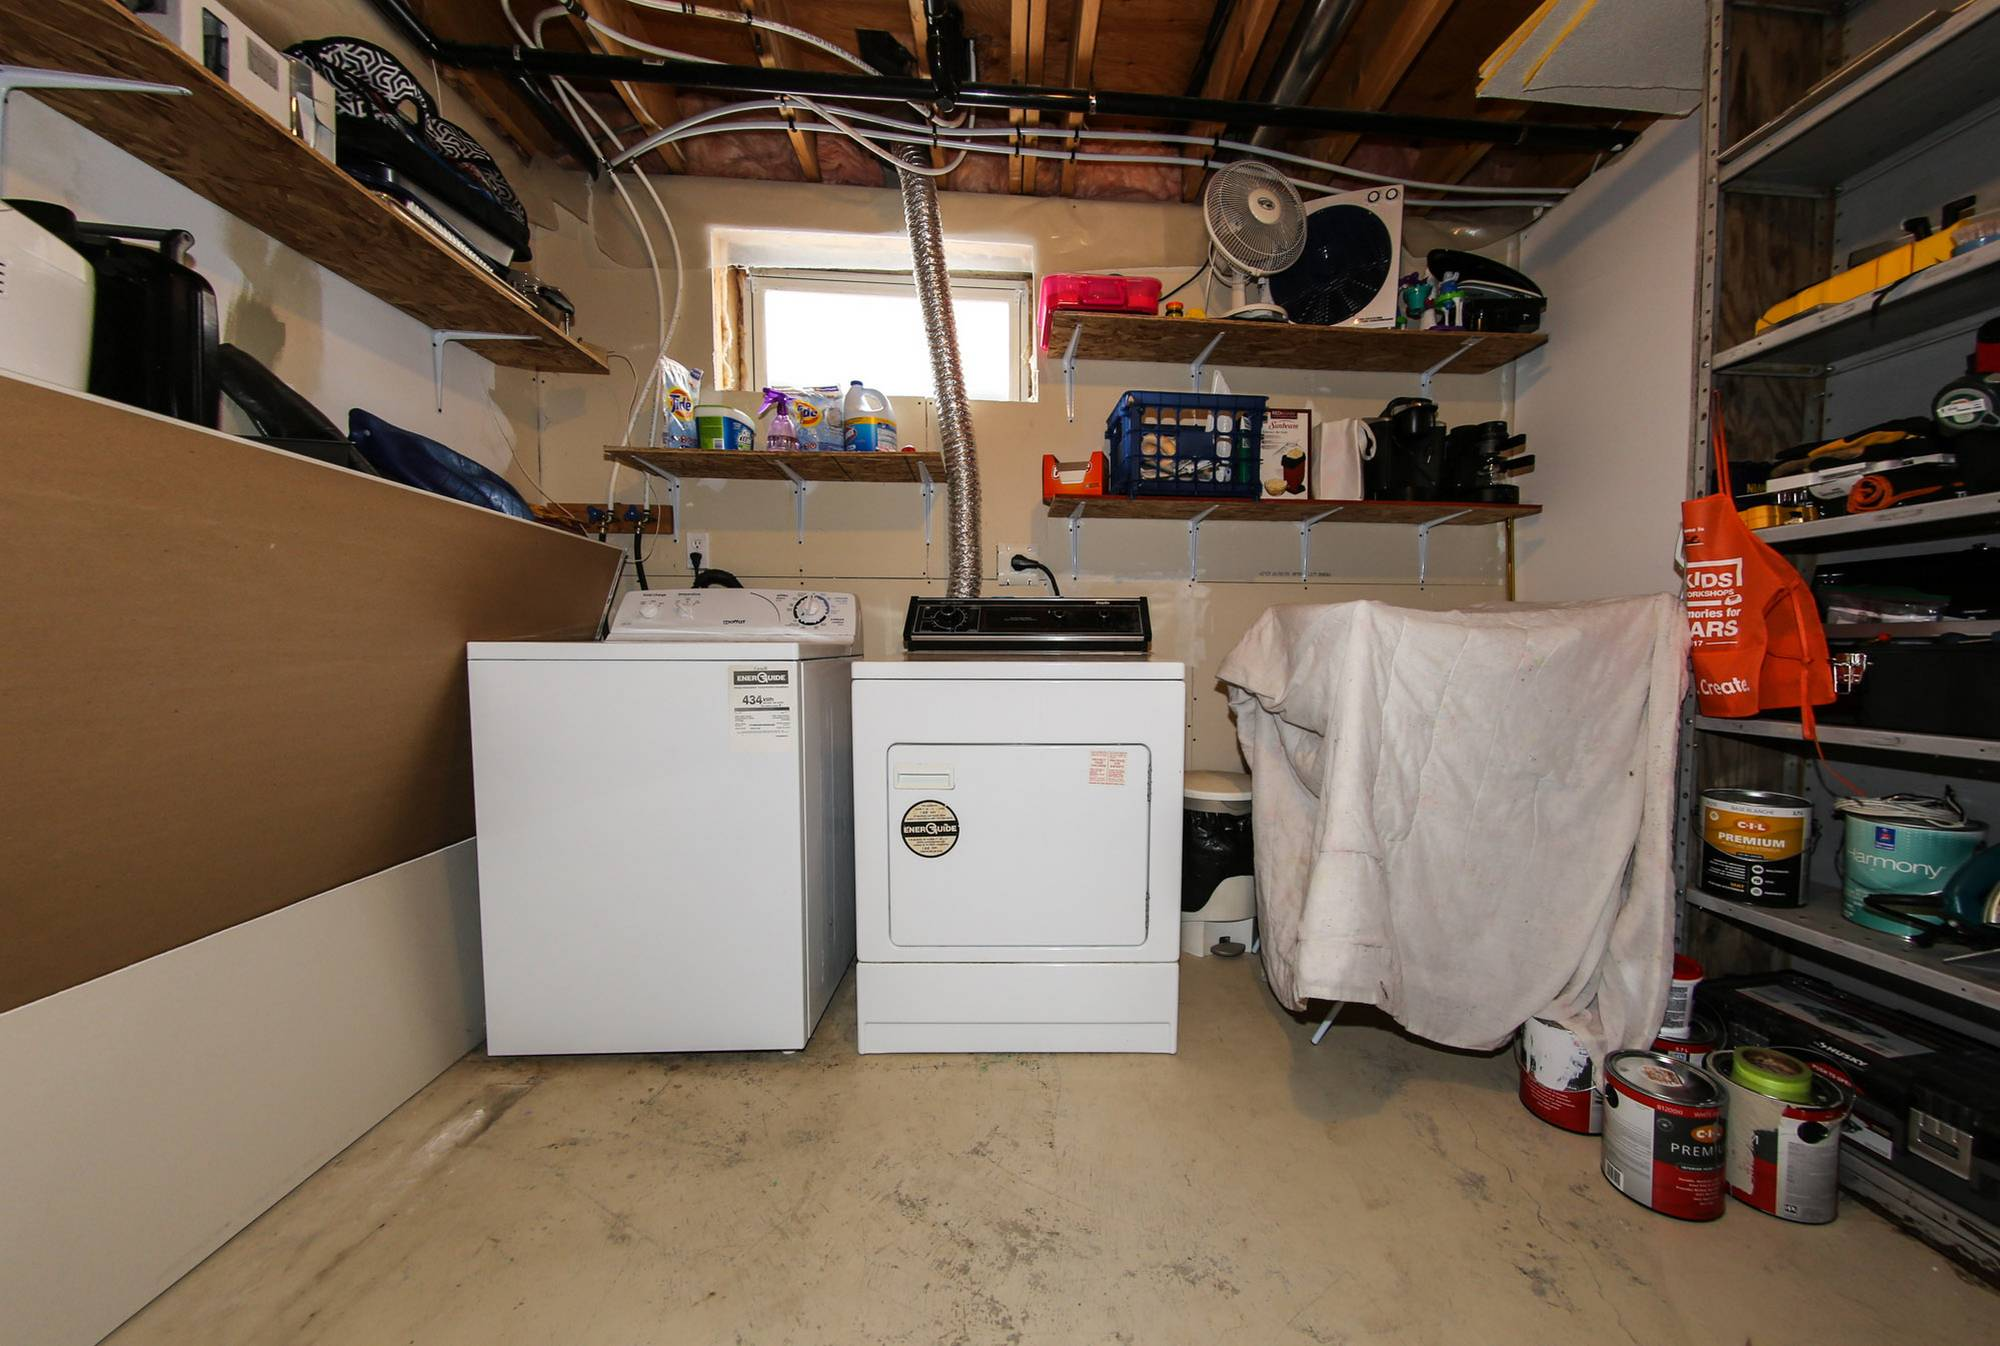 856 Kernaghan Avenue, Winnipeg, Manitoba  R2C 4Z5 - Photo 25 - 1905124